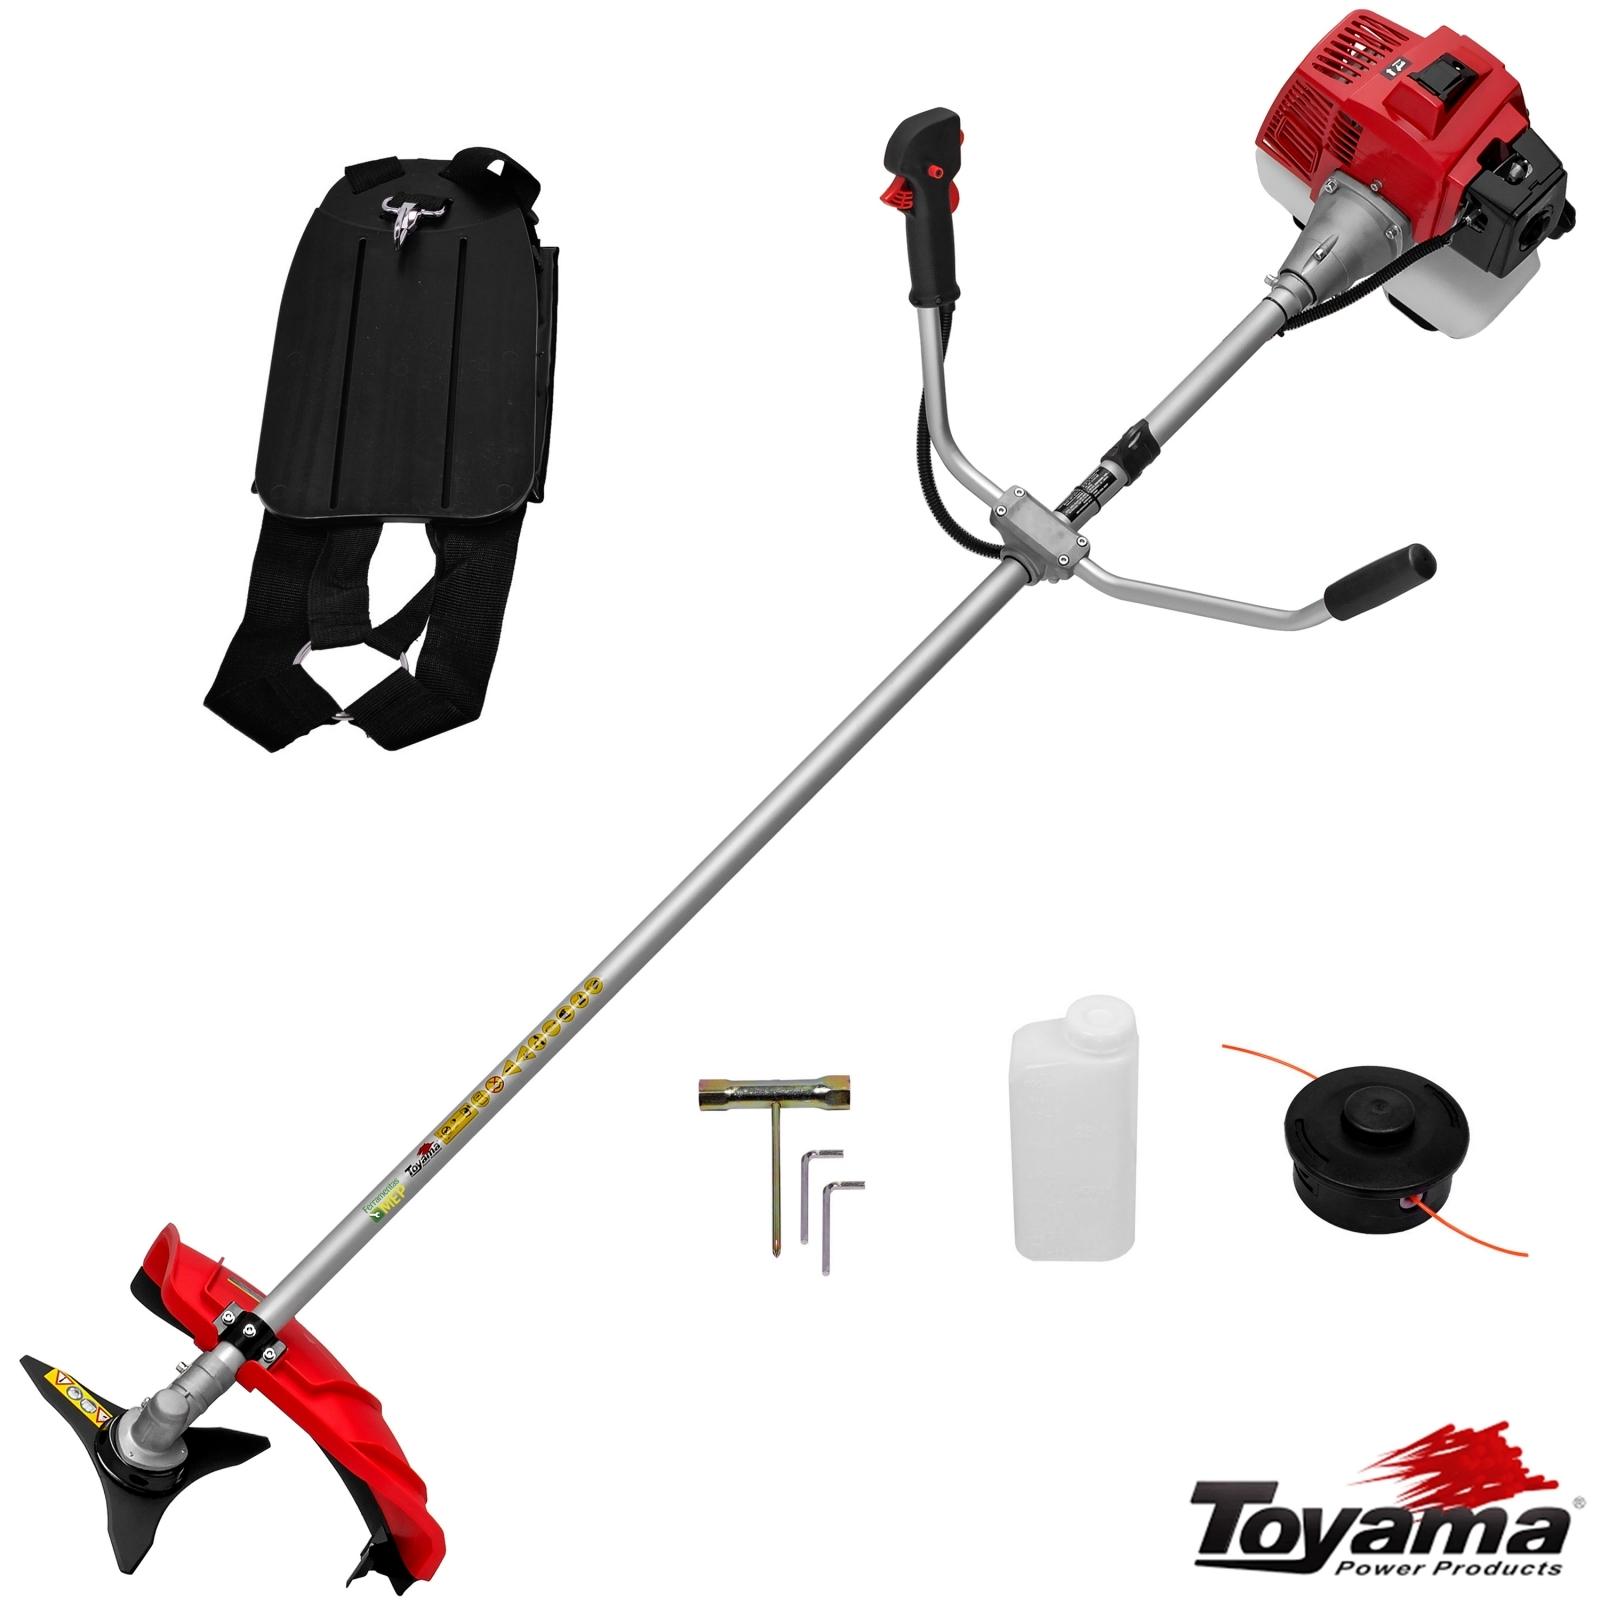 Roçadeira Lateral A Gasolina Toyama Tbc52x 51,2cc - Ro3 - Ferramentas MEP